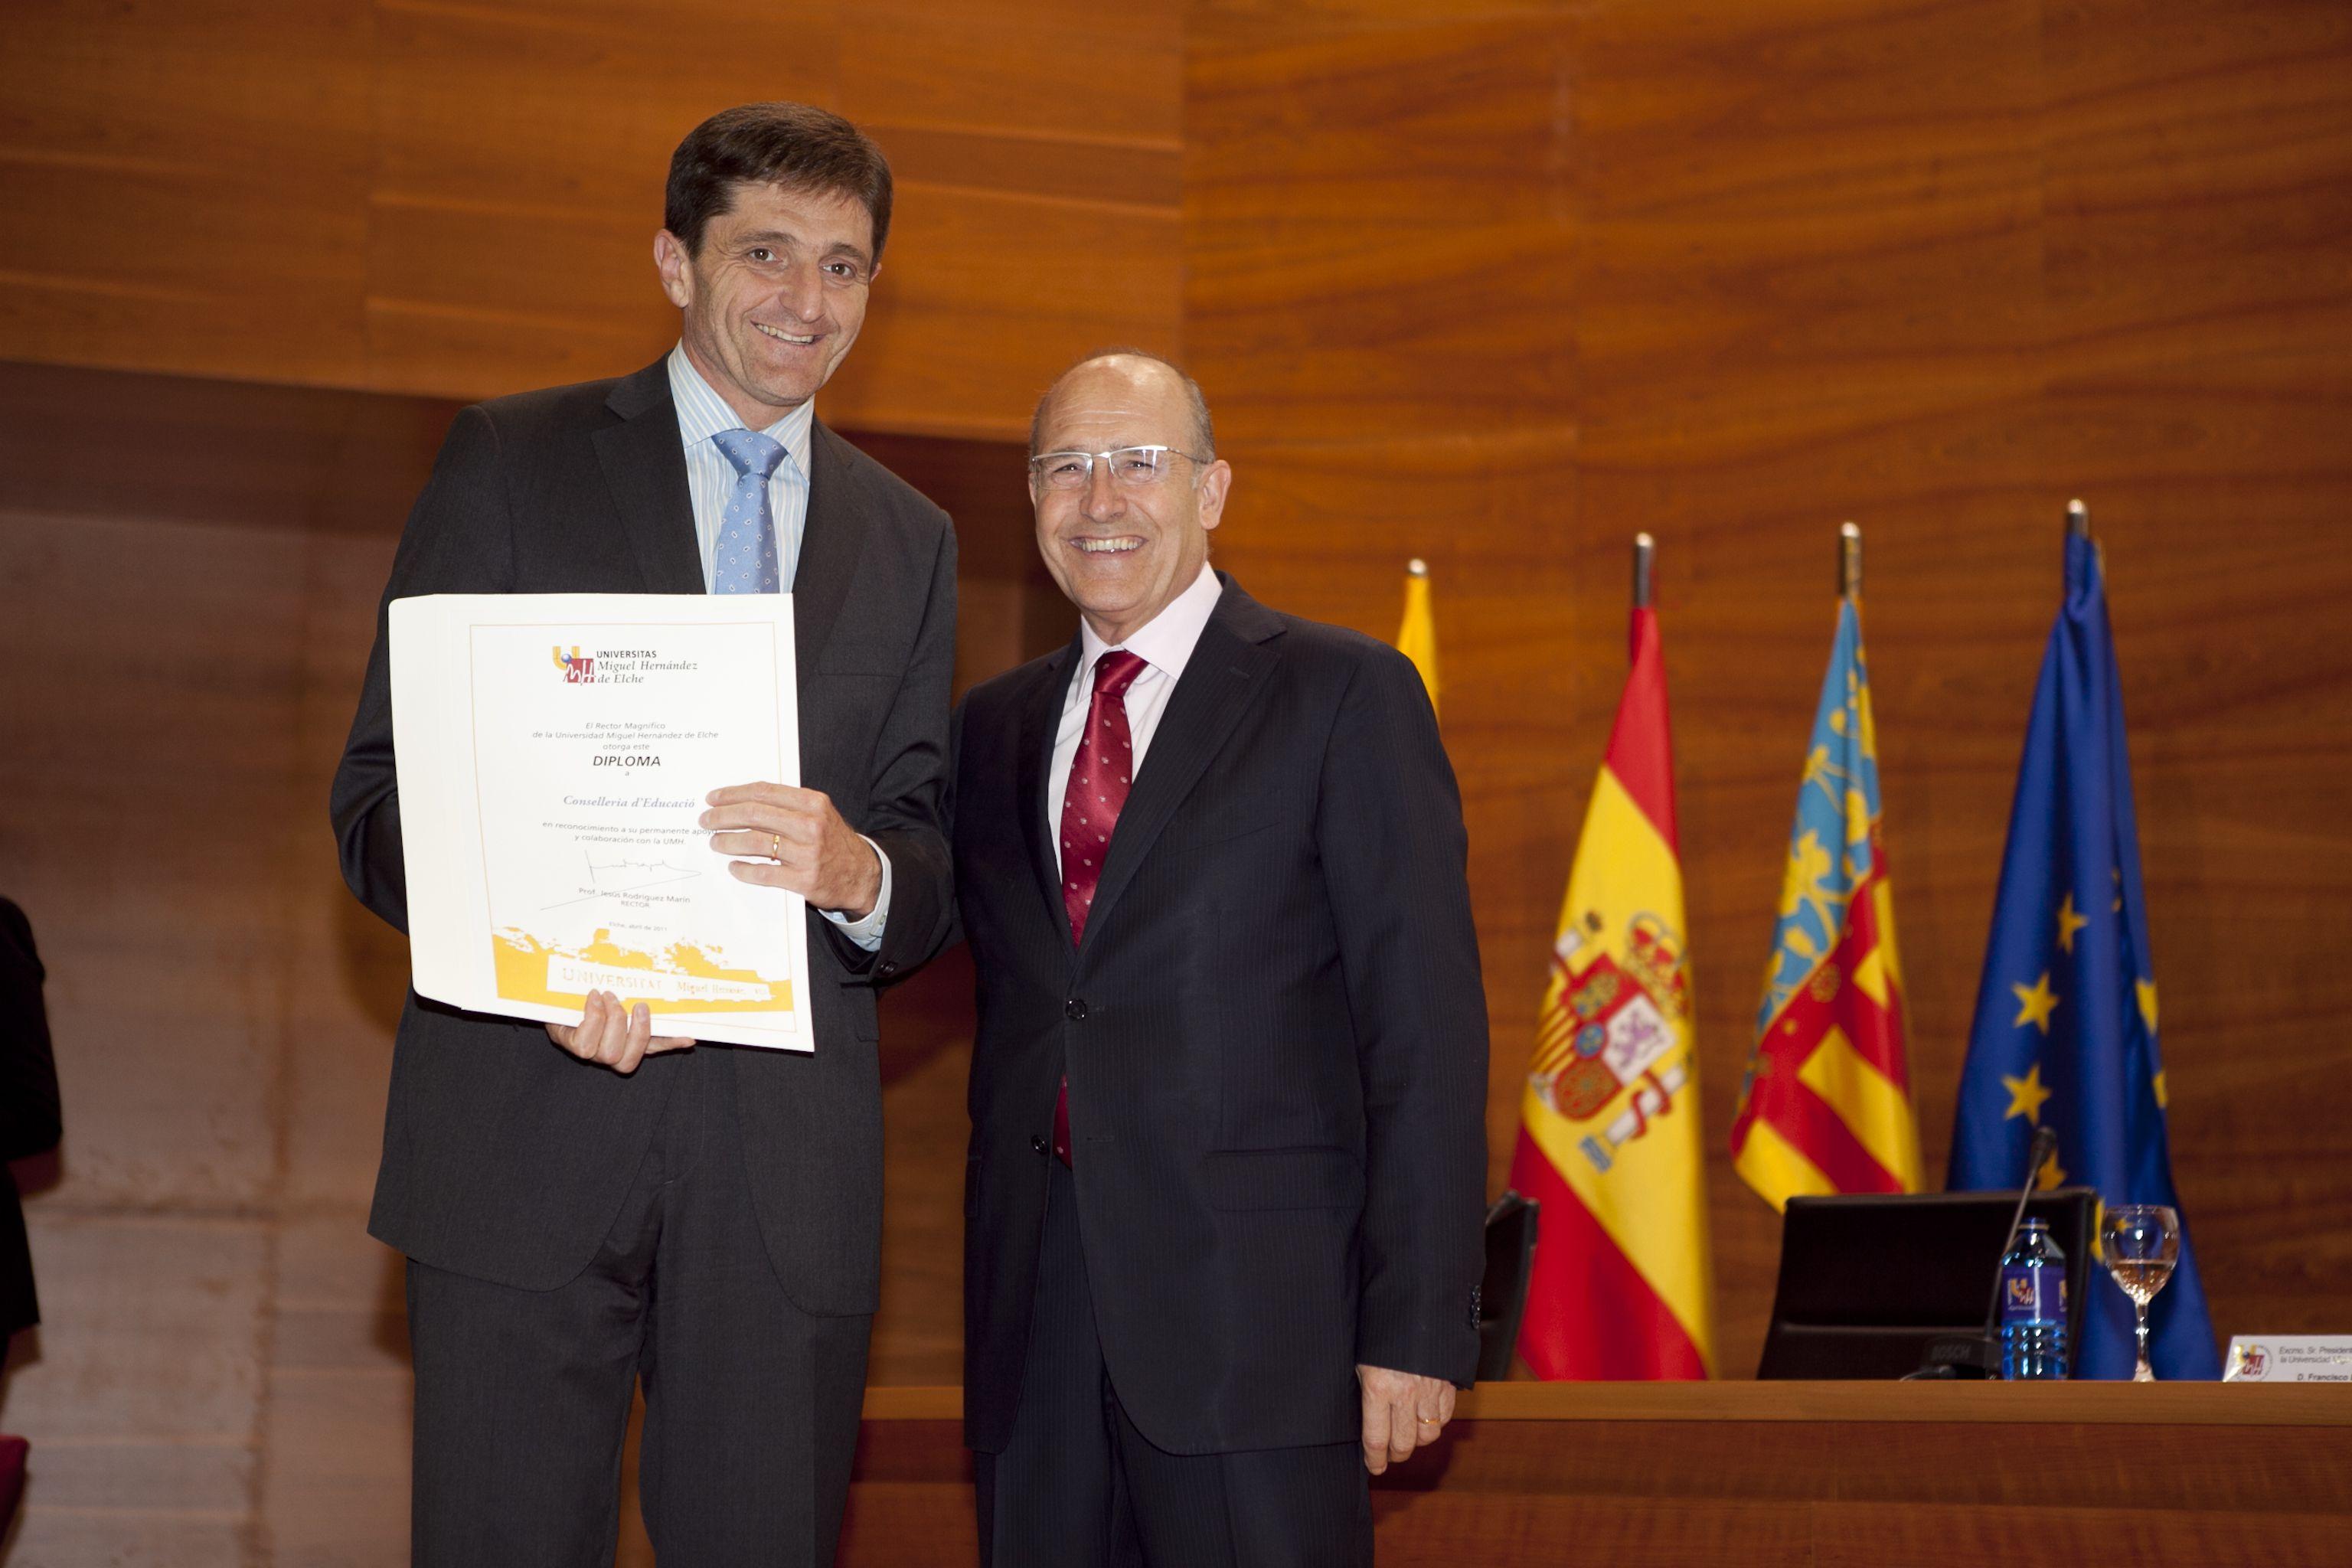 umh-diplomas-rector_mg_7046.jpg